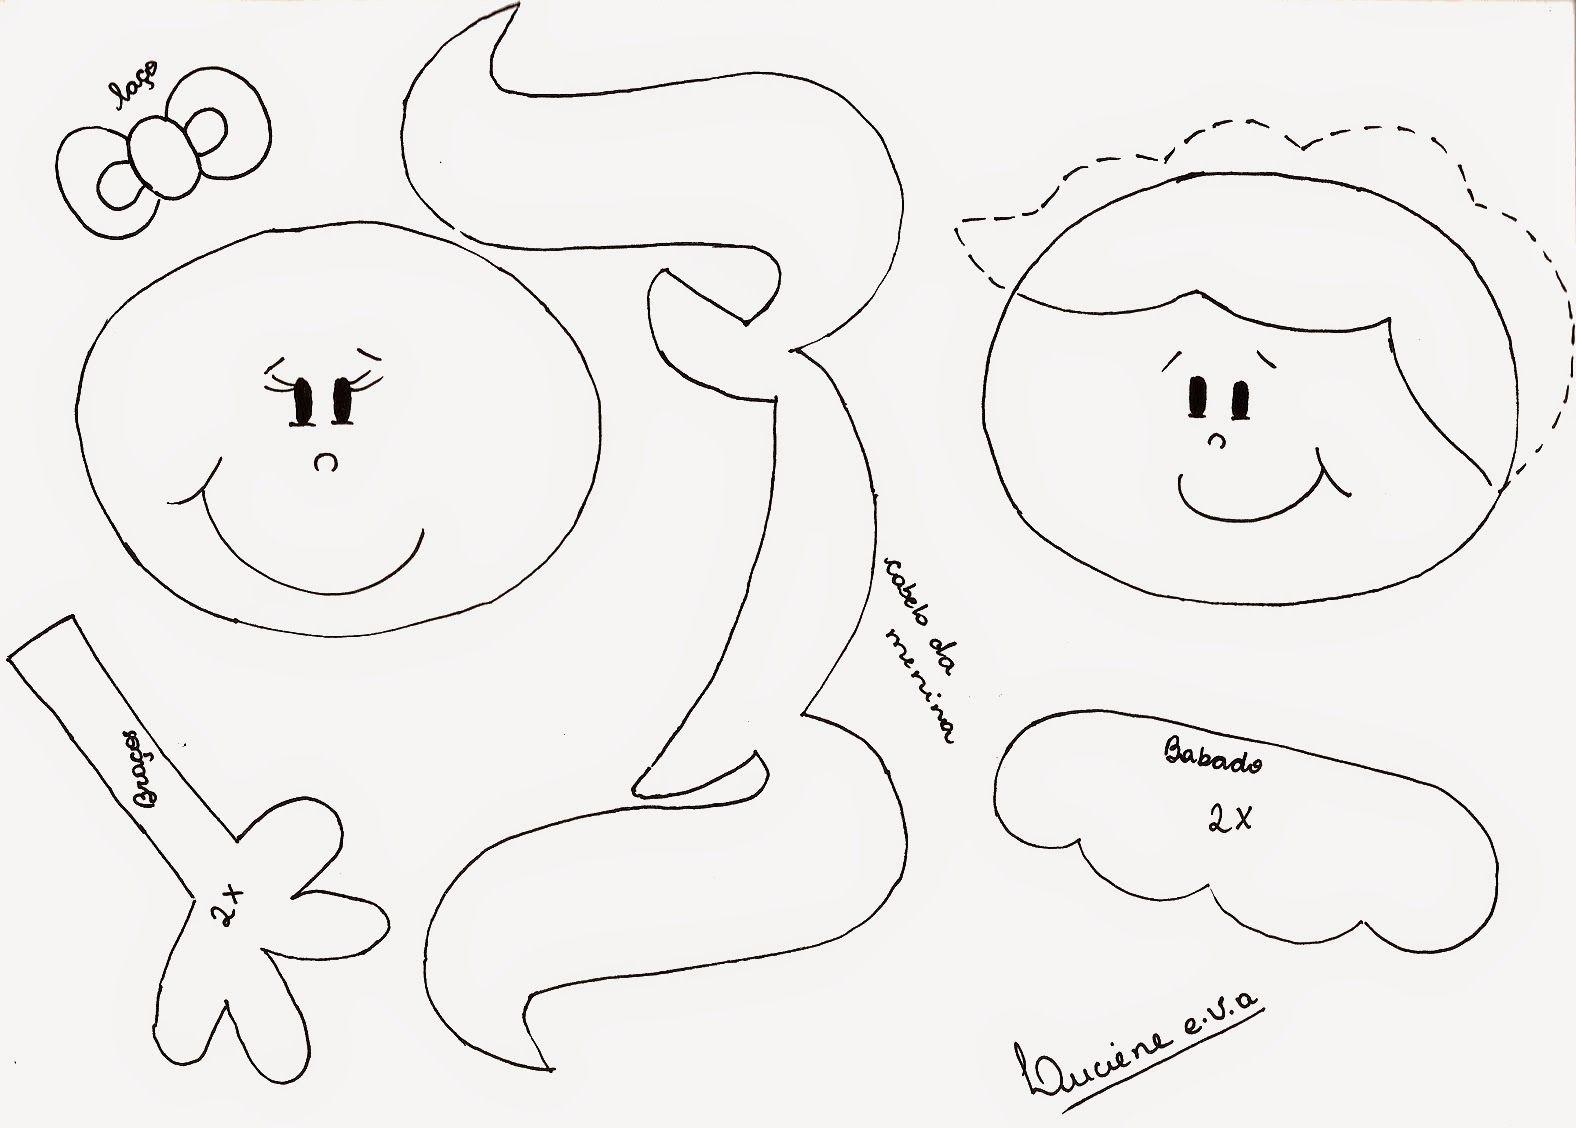 Pin Em Dibujos Y Moldes